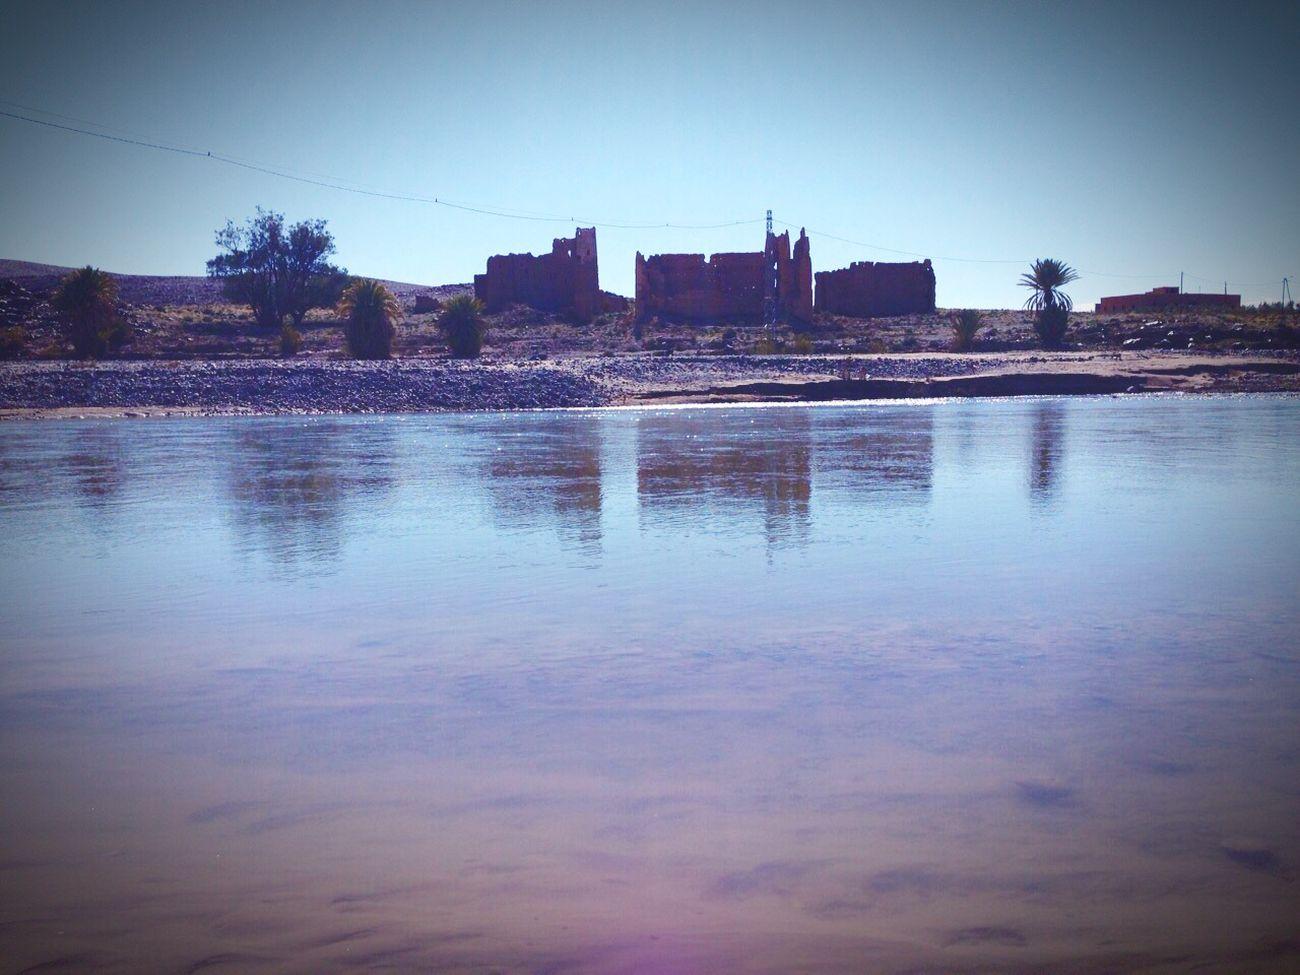 M.EL AAMRANI Imassine Timiright Assif Daraa Ouarzazate Marocco Idarnin